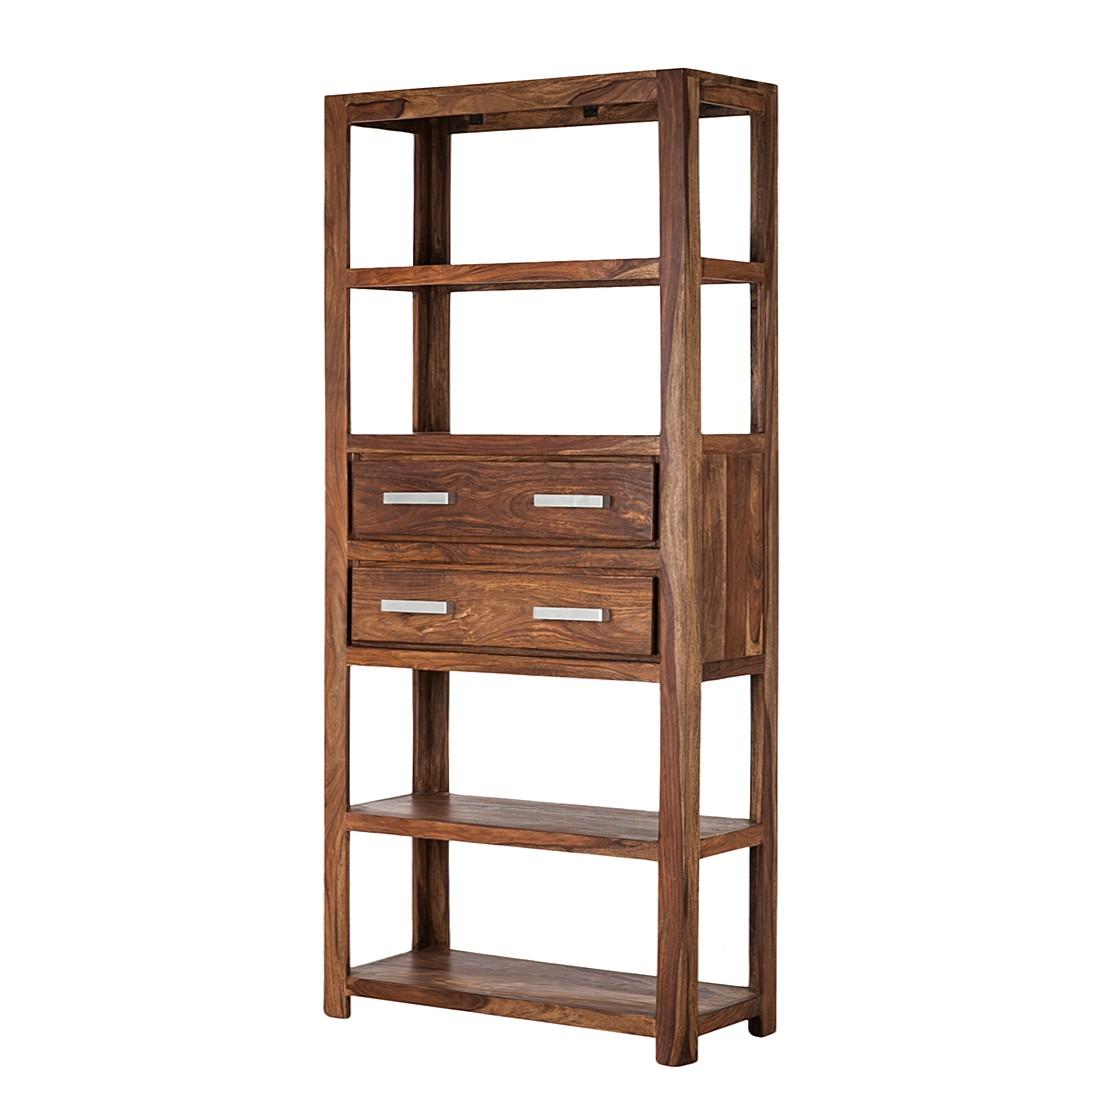 etagere a livres invisible conceal grand modele comparer les prix et promo. Black Bedroom Furniture Sets. Home Design Ideas